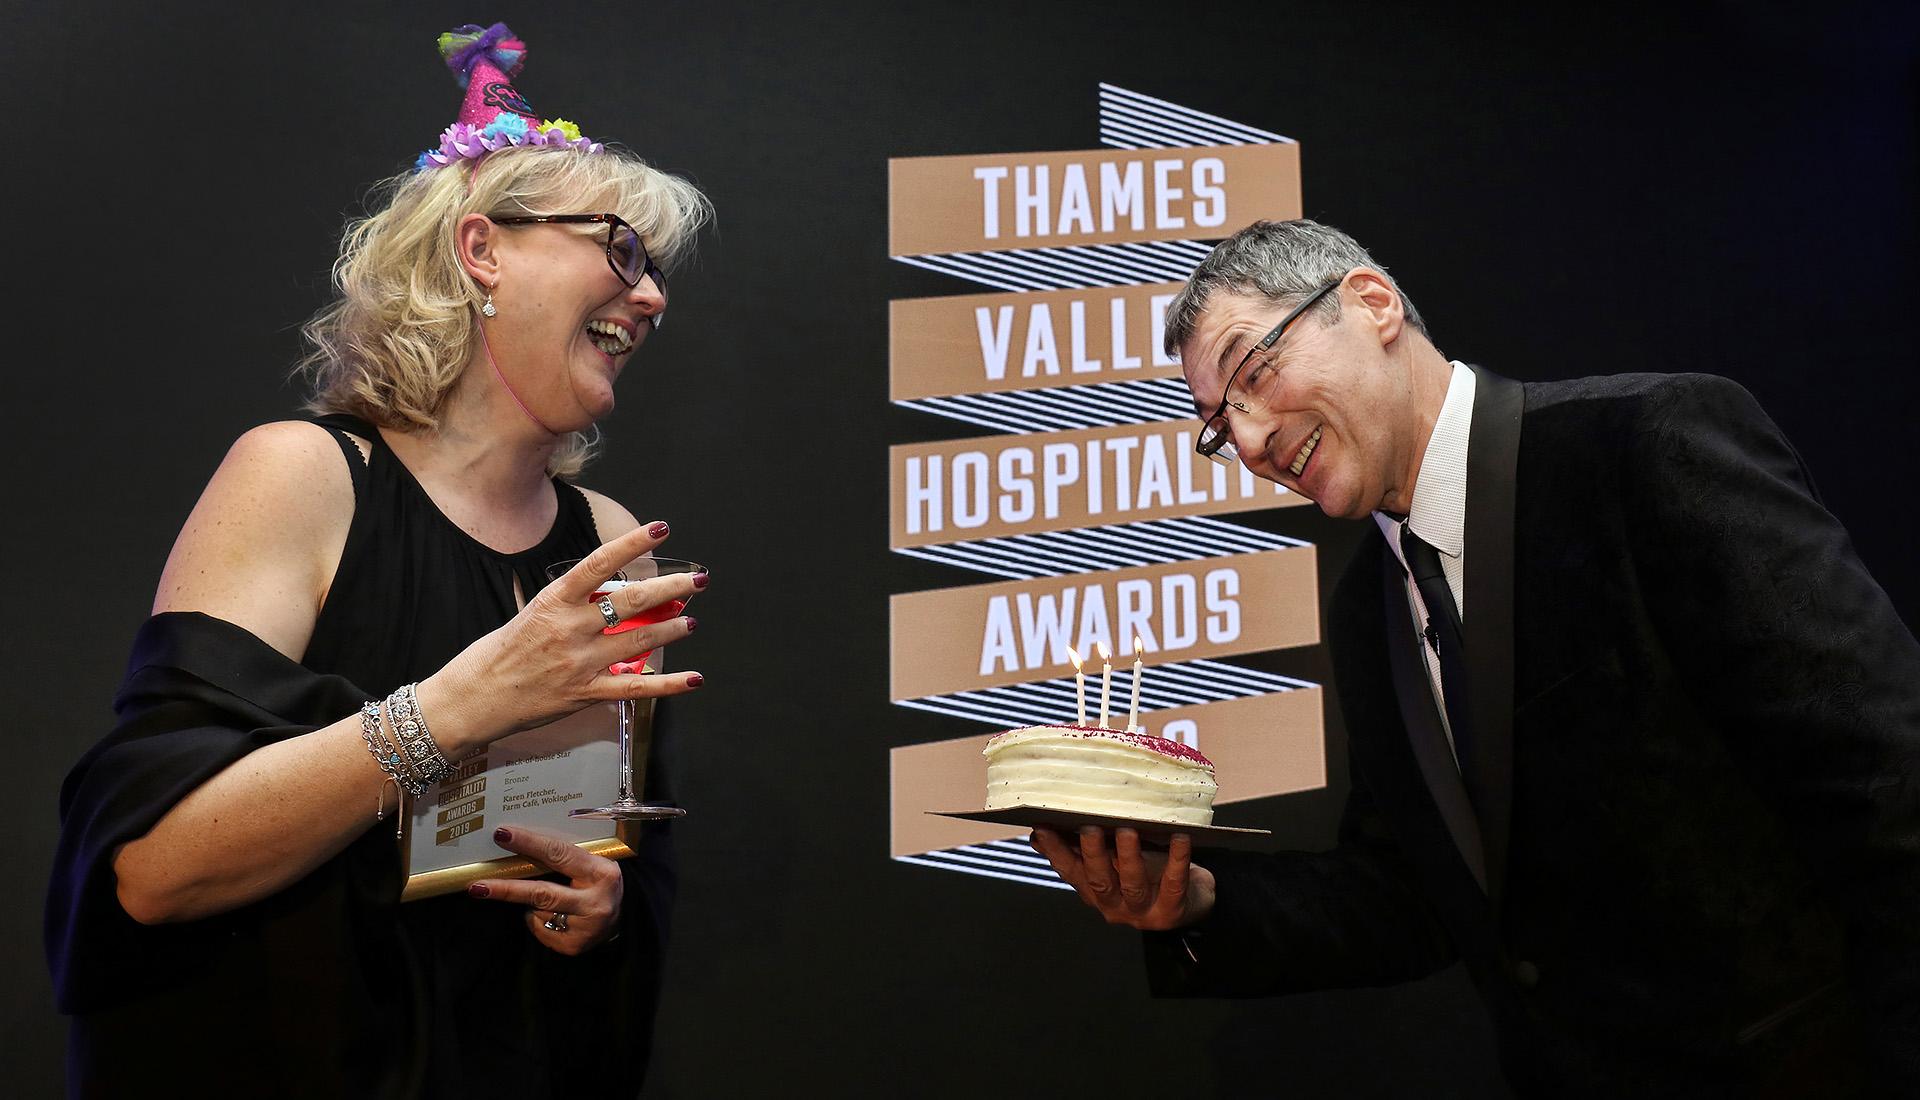 Thames Valley Hospitality Awards Logo